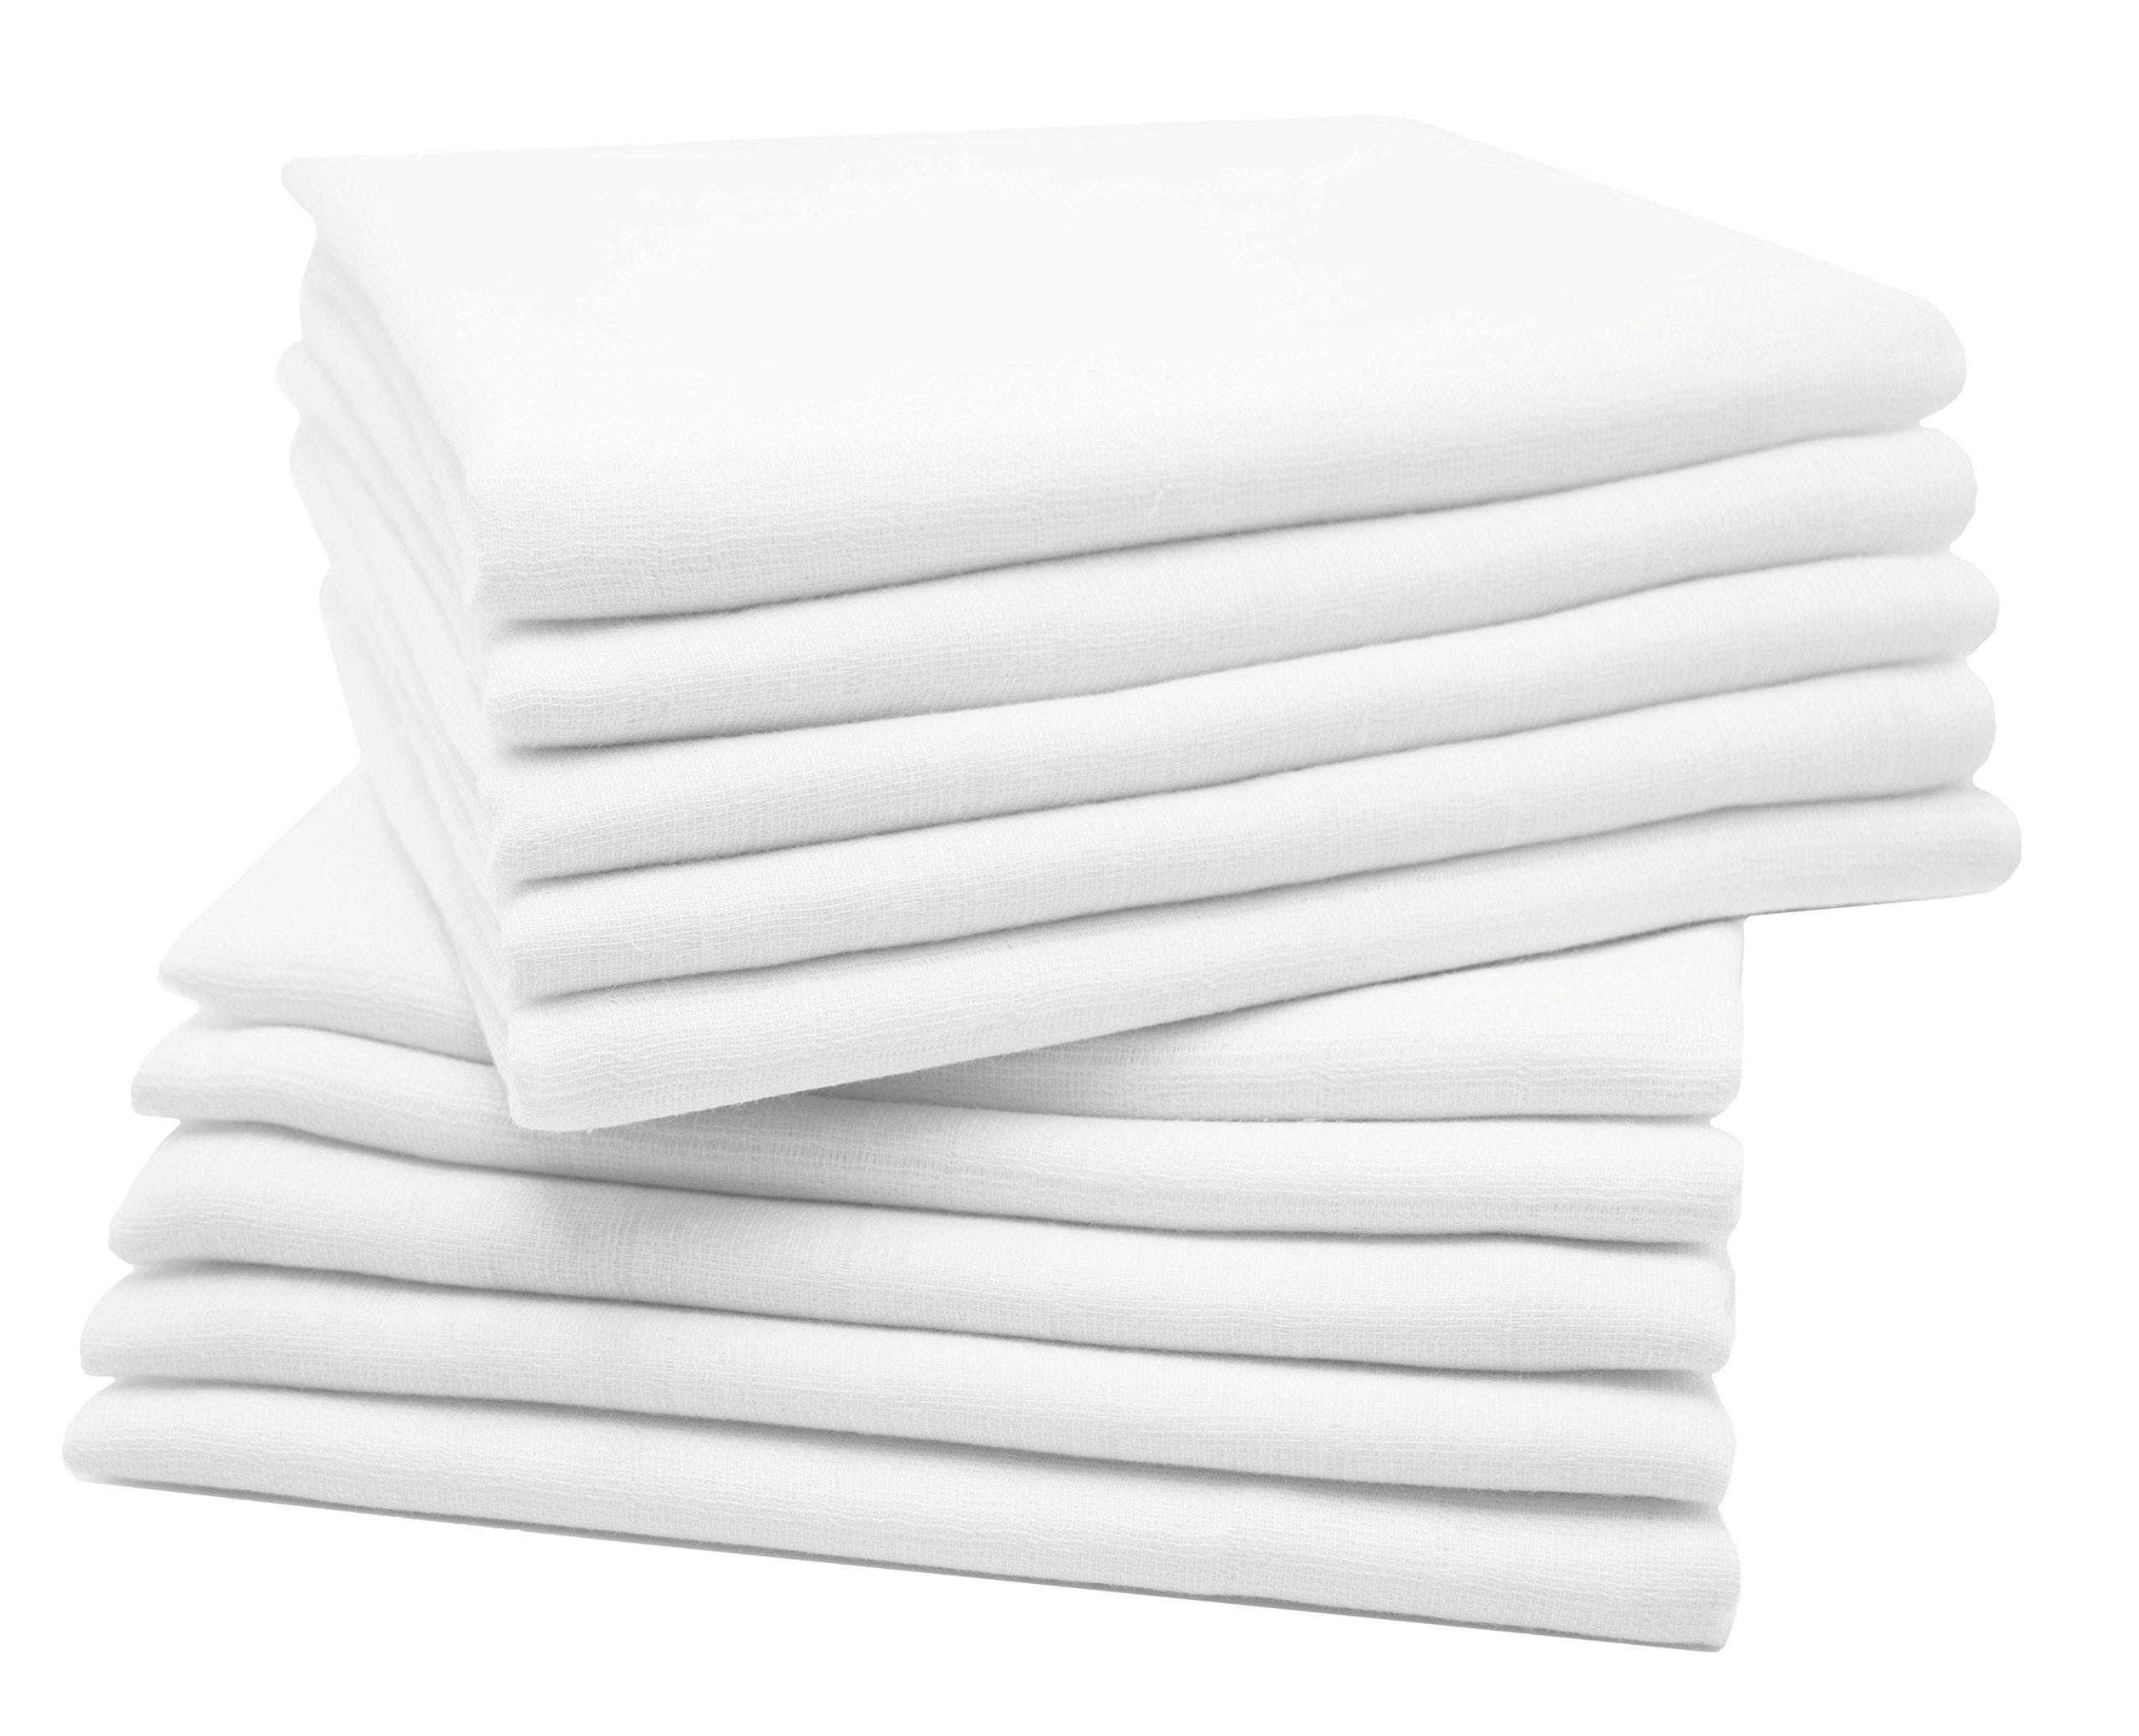 Zollner 10 muselinas para bebé, algodón 100%, 80x80 cm, blancas product image